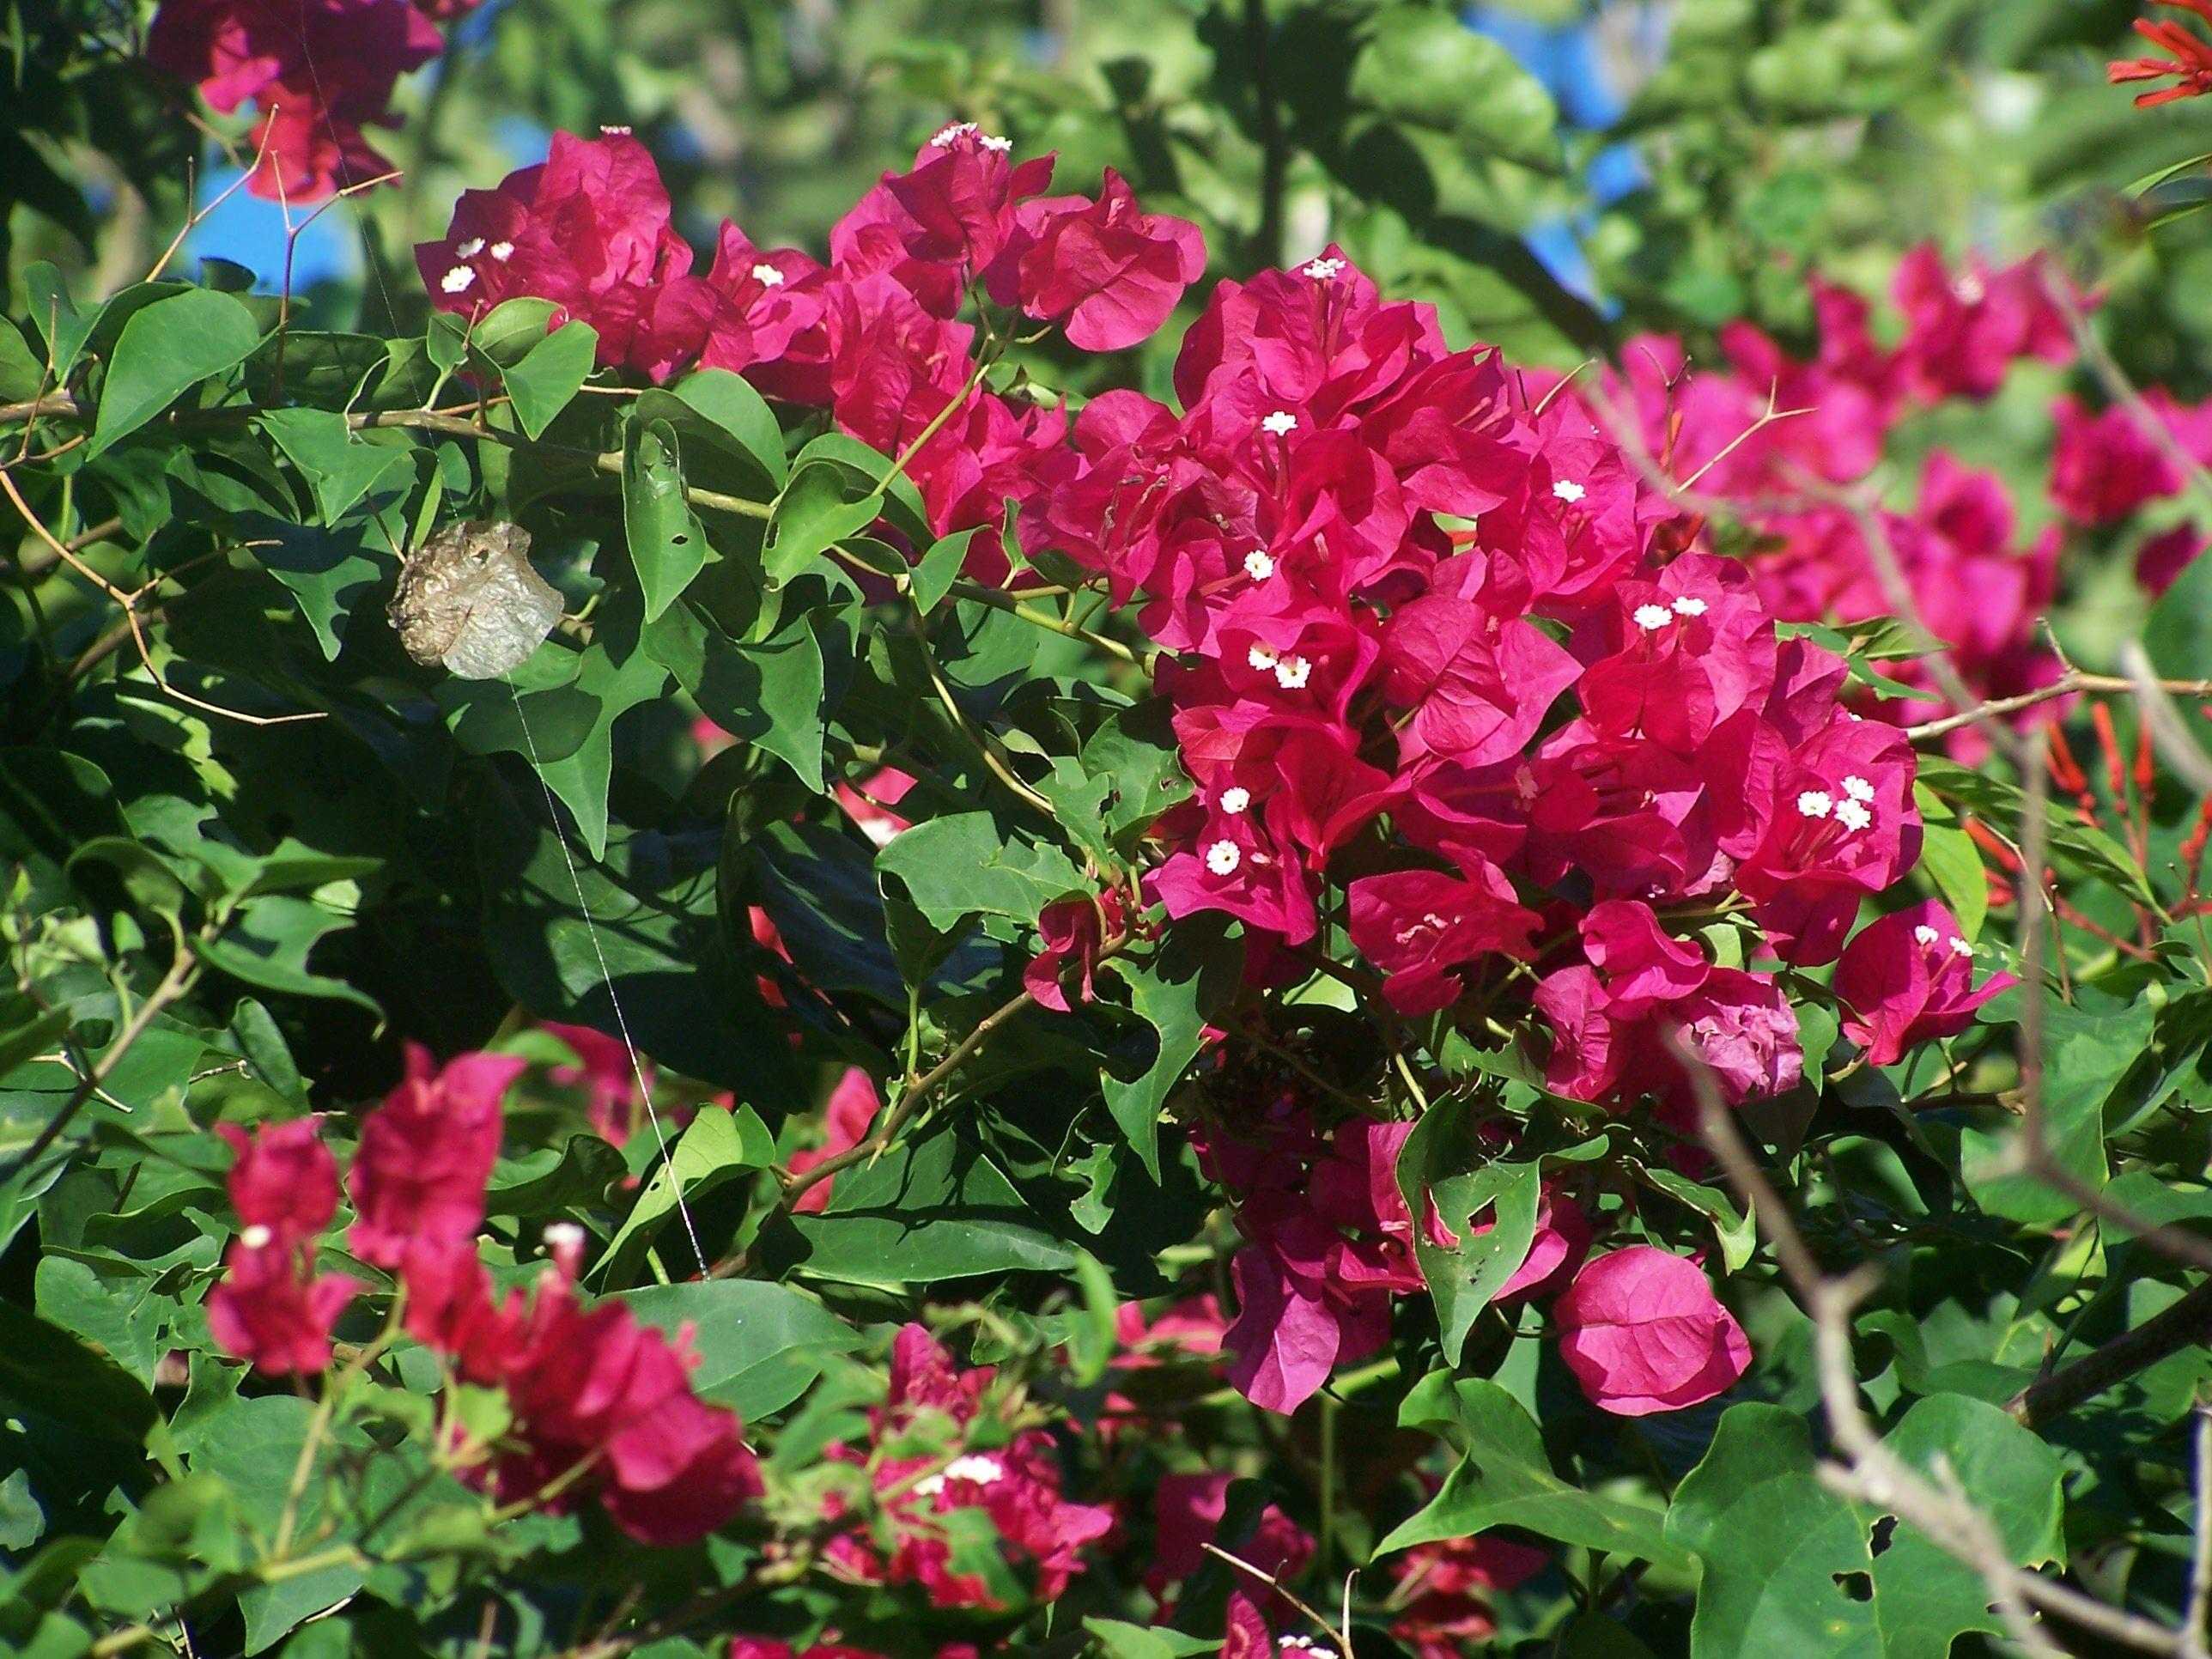 bougainvillea | Gardening | Pinterest | Bougainvillea, Plants and Yards